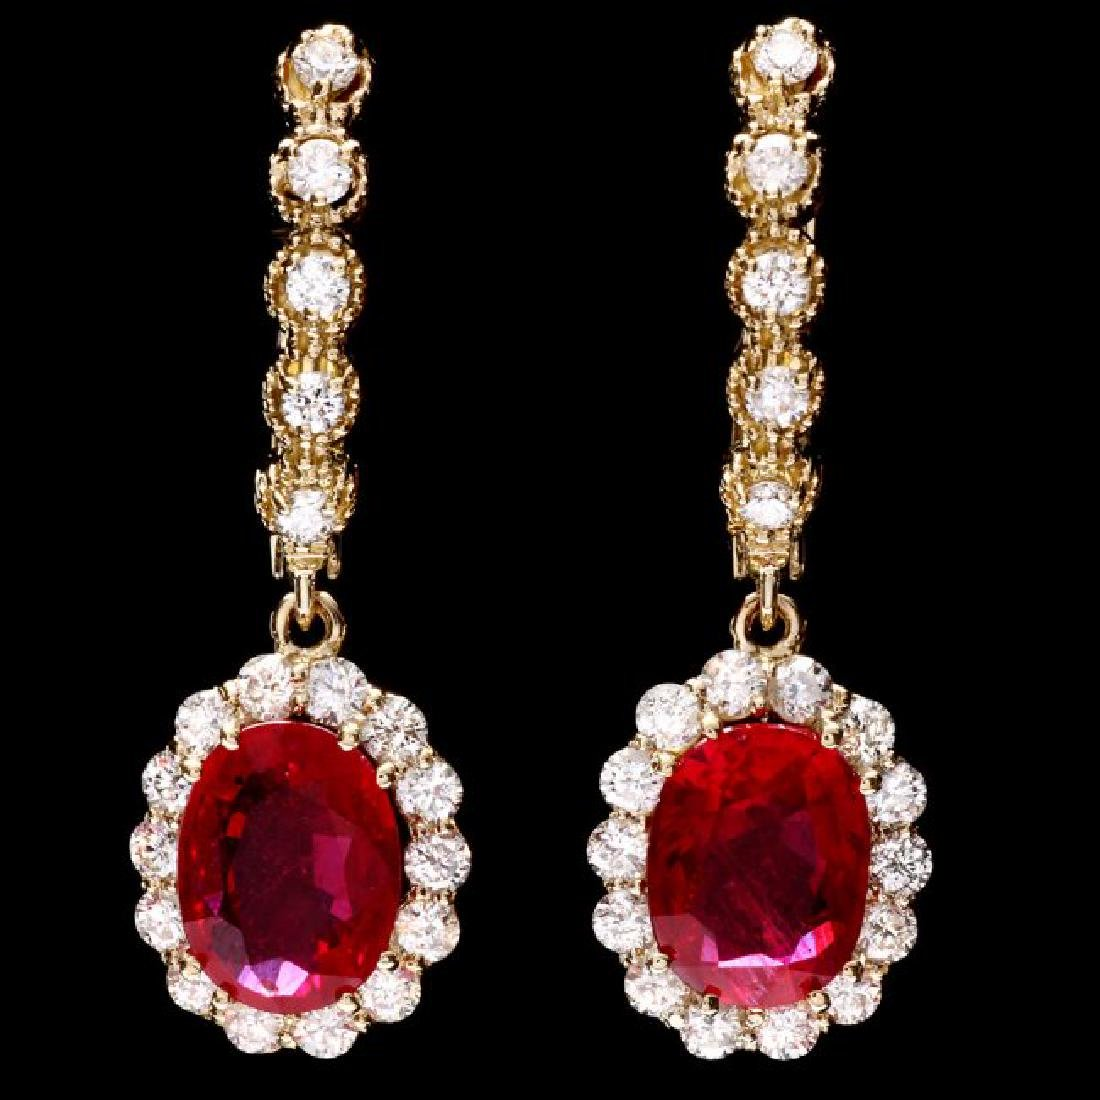 14k Gold 5.00ct Ruby 1.45ct Diamond Earrings